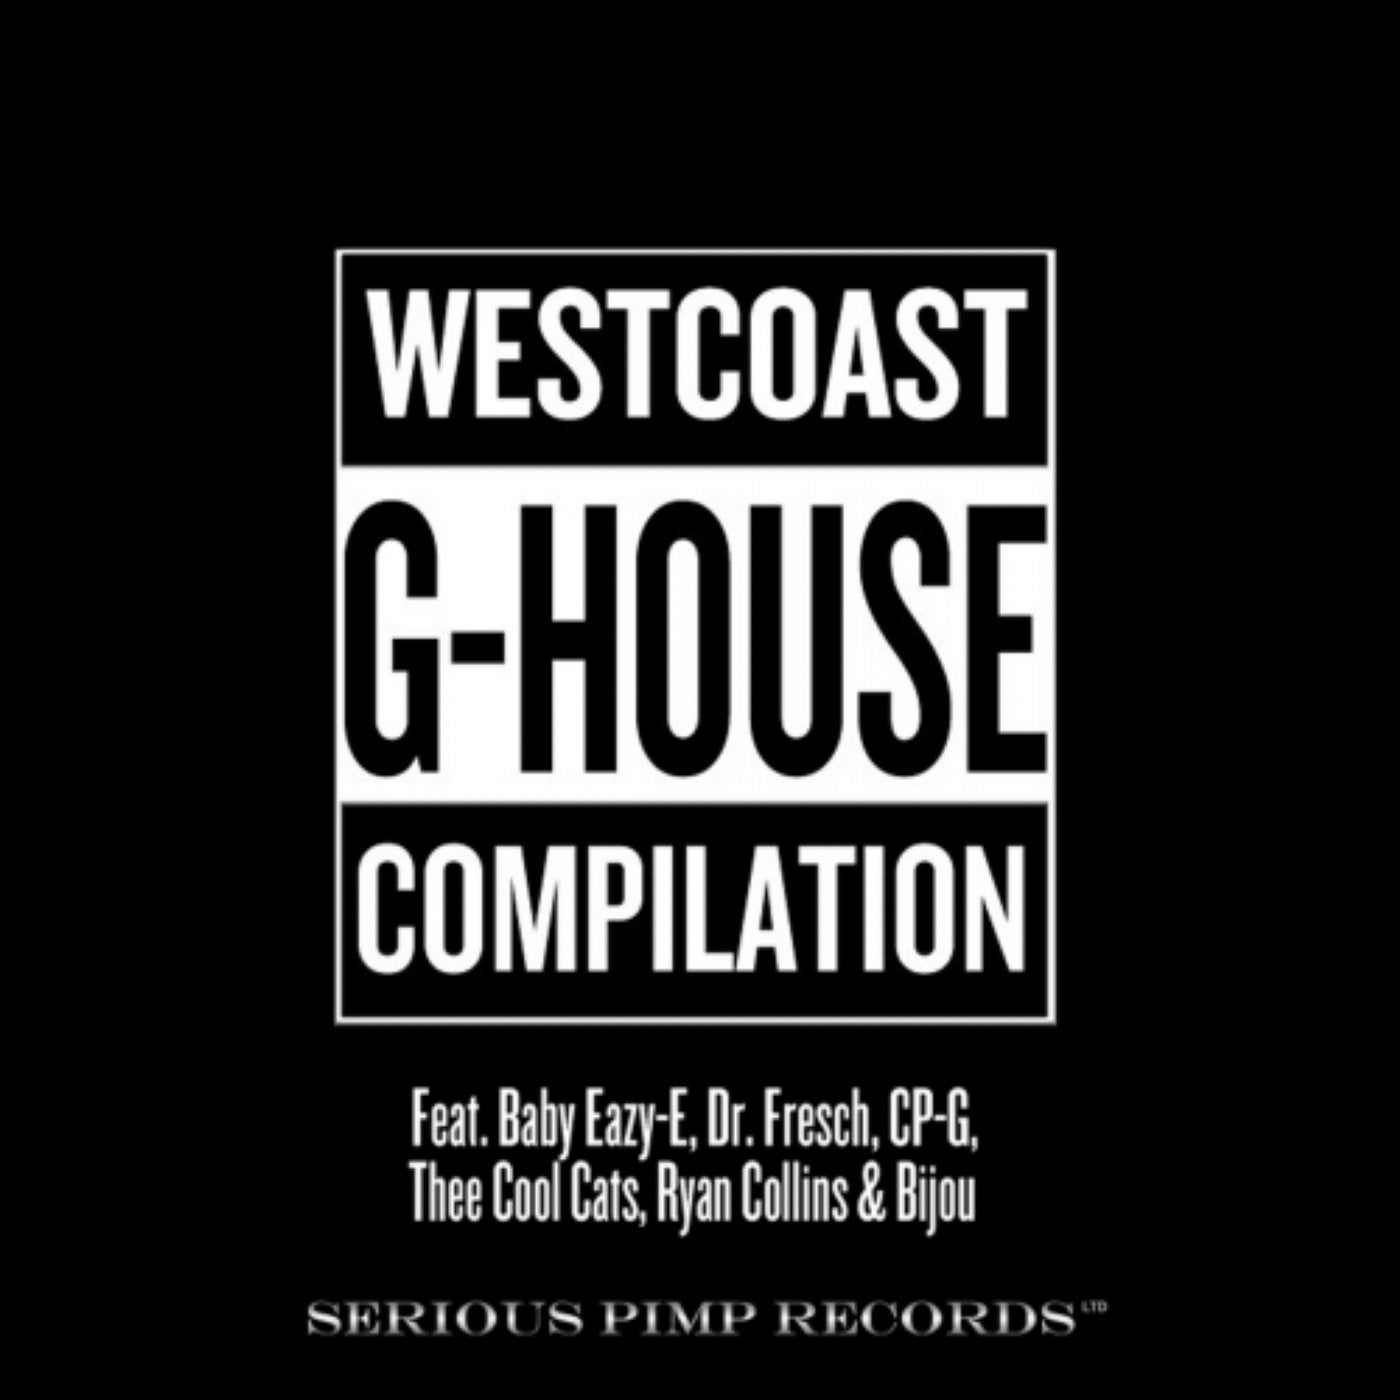 Gangsta Gangsta (feat. Baby Eazy-E) (Original Mix)